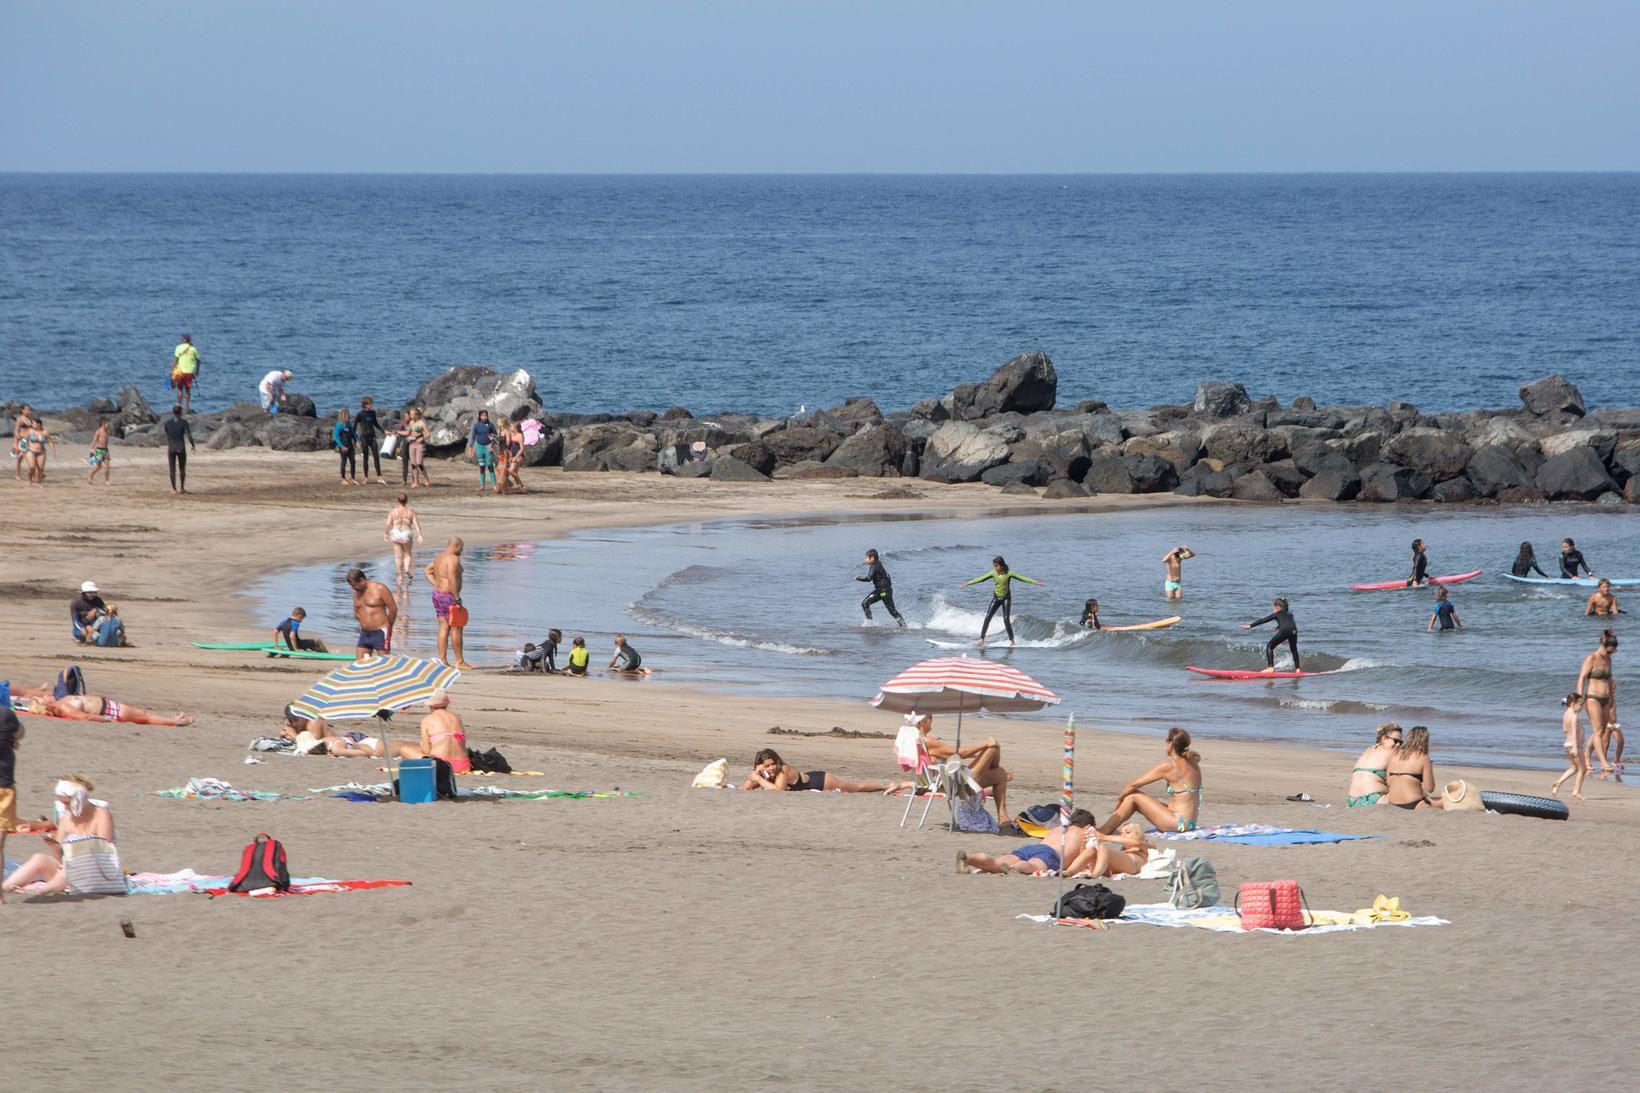 Ljósmynd tekin á Playa de Las Amaricas þann 28. júlí …